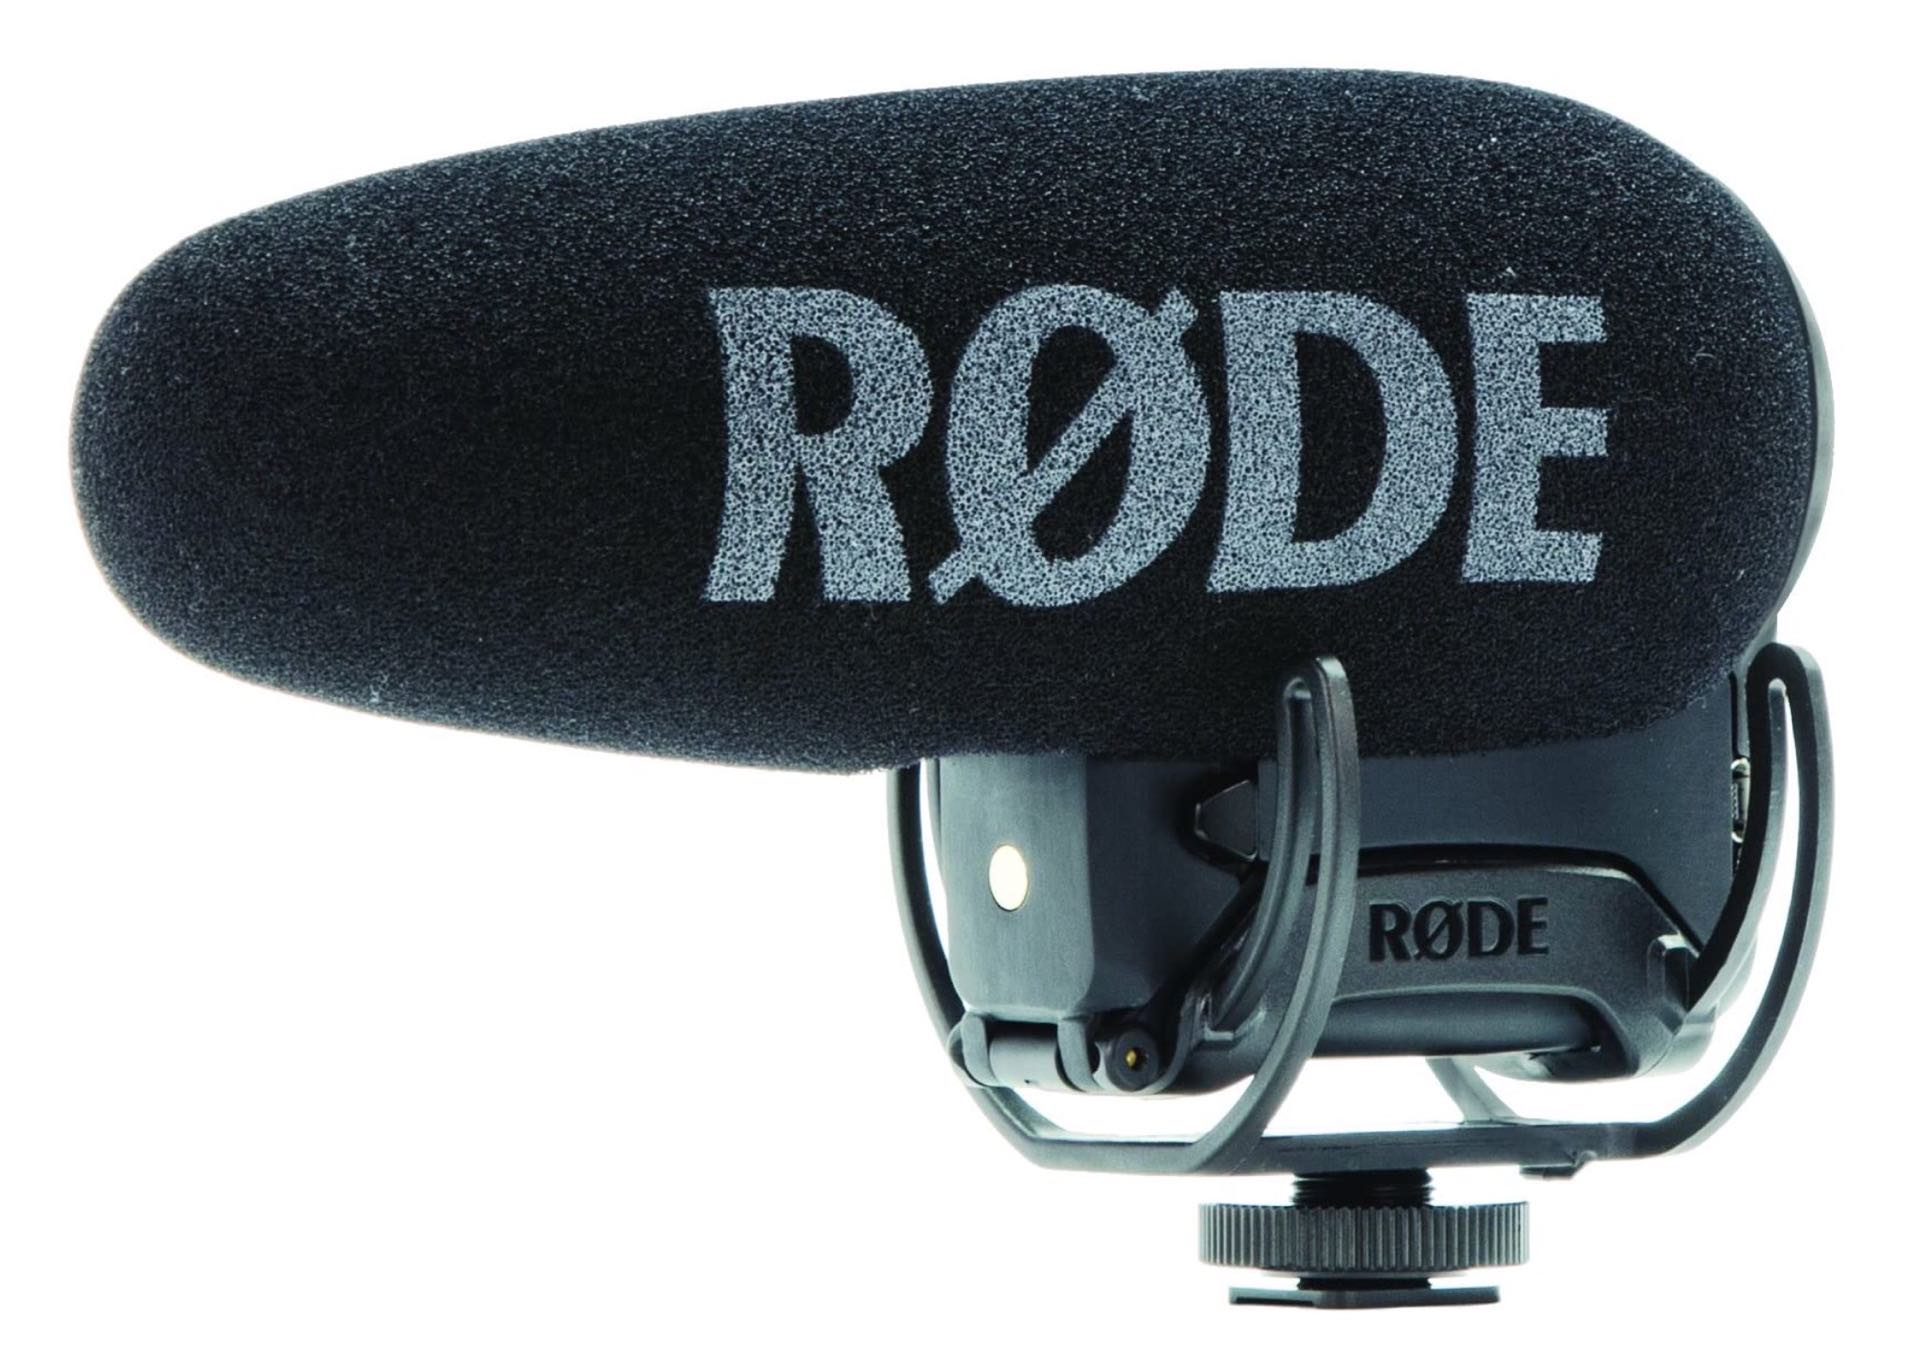 rode-videomic-pro-on-camera-shotgun-condenser-microphone